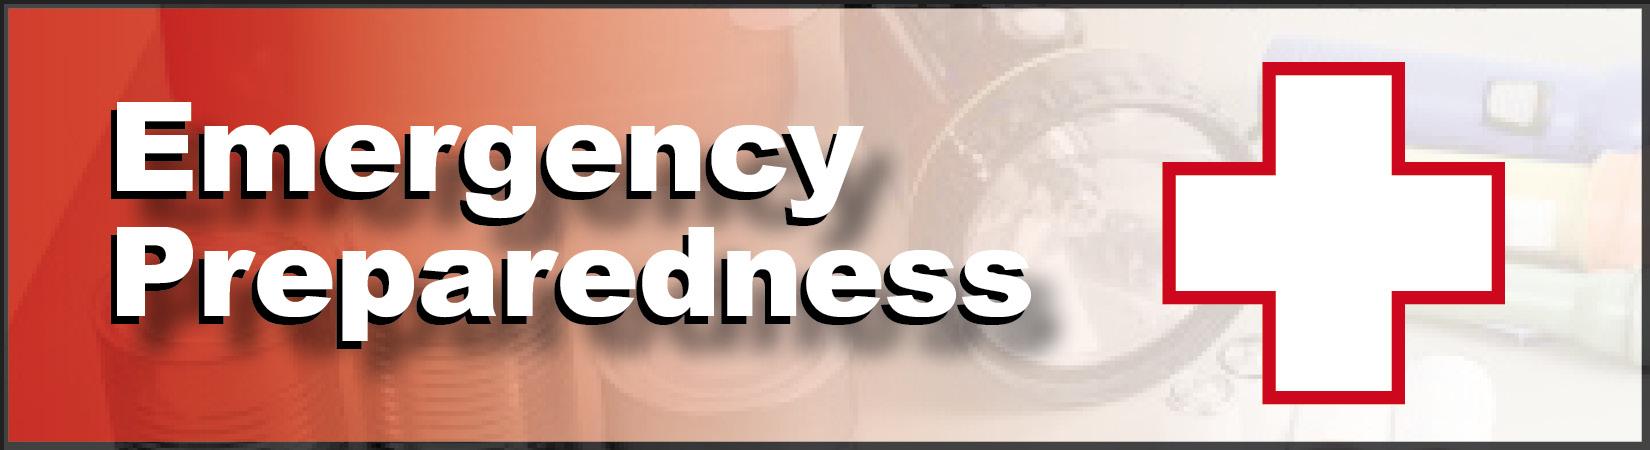 bountiful city emergency preparedness